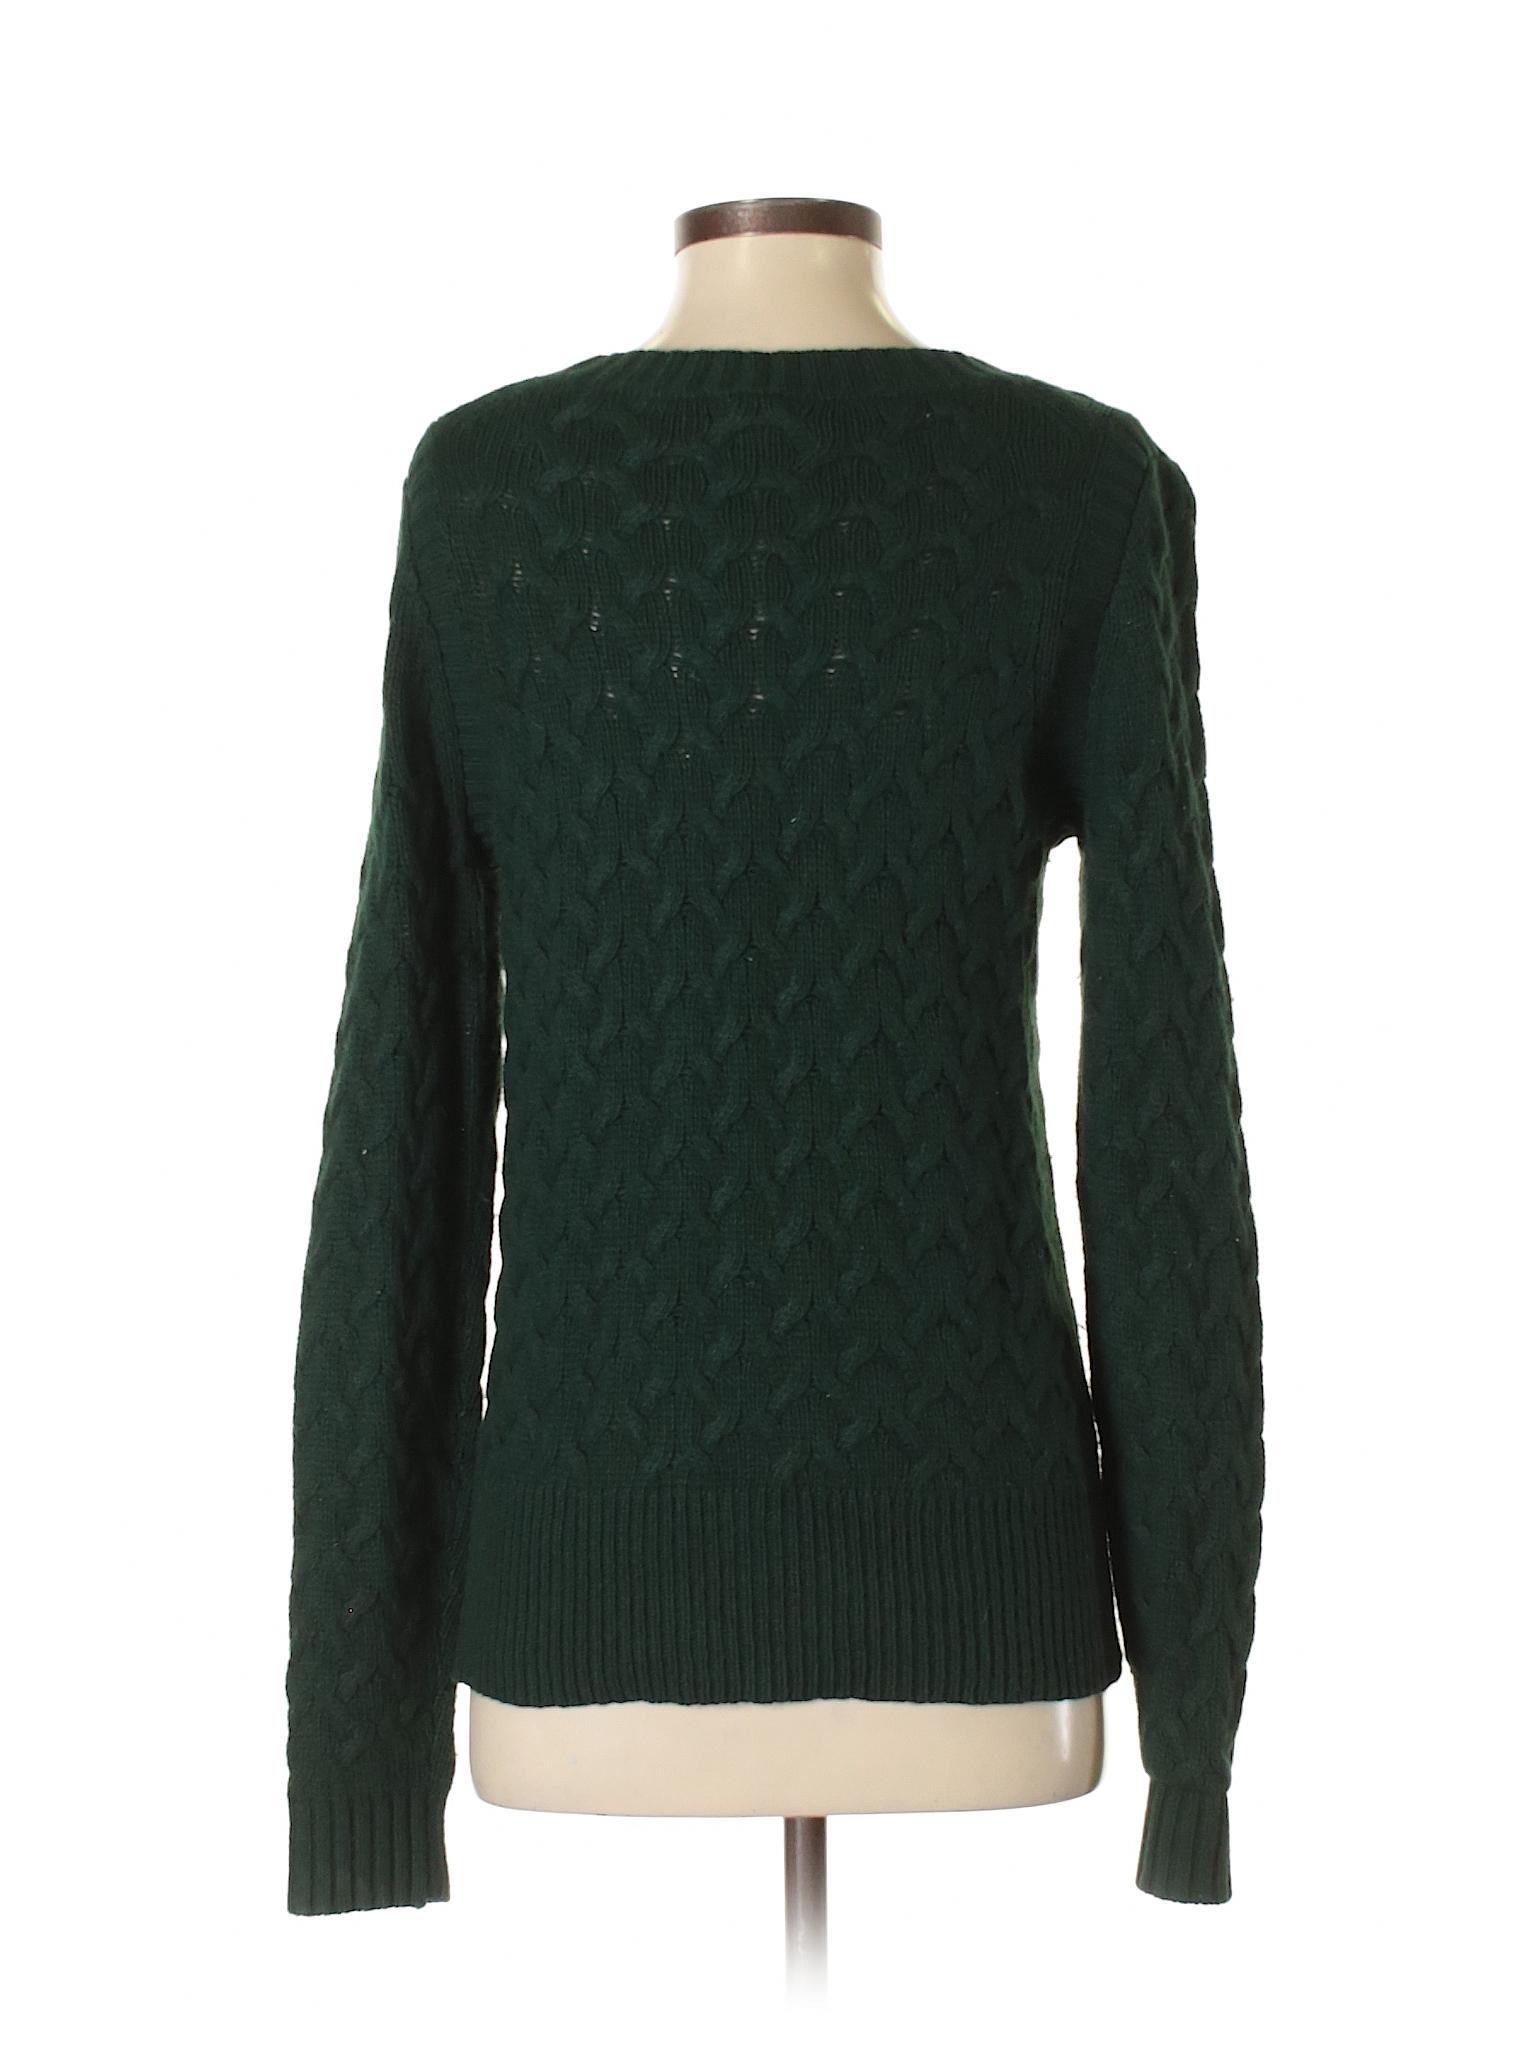 Crew J Pullover Sweater winter Boutique ETqwPP